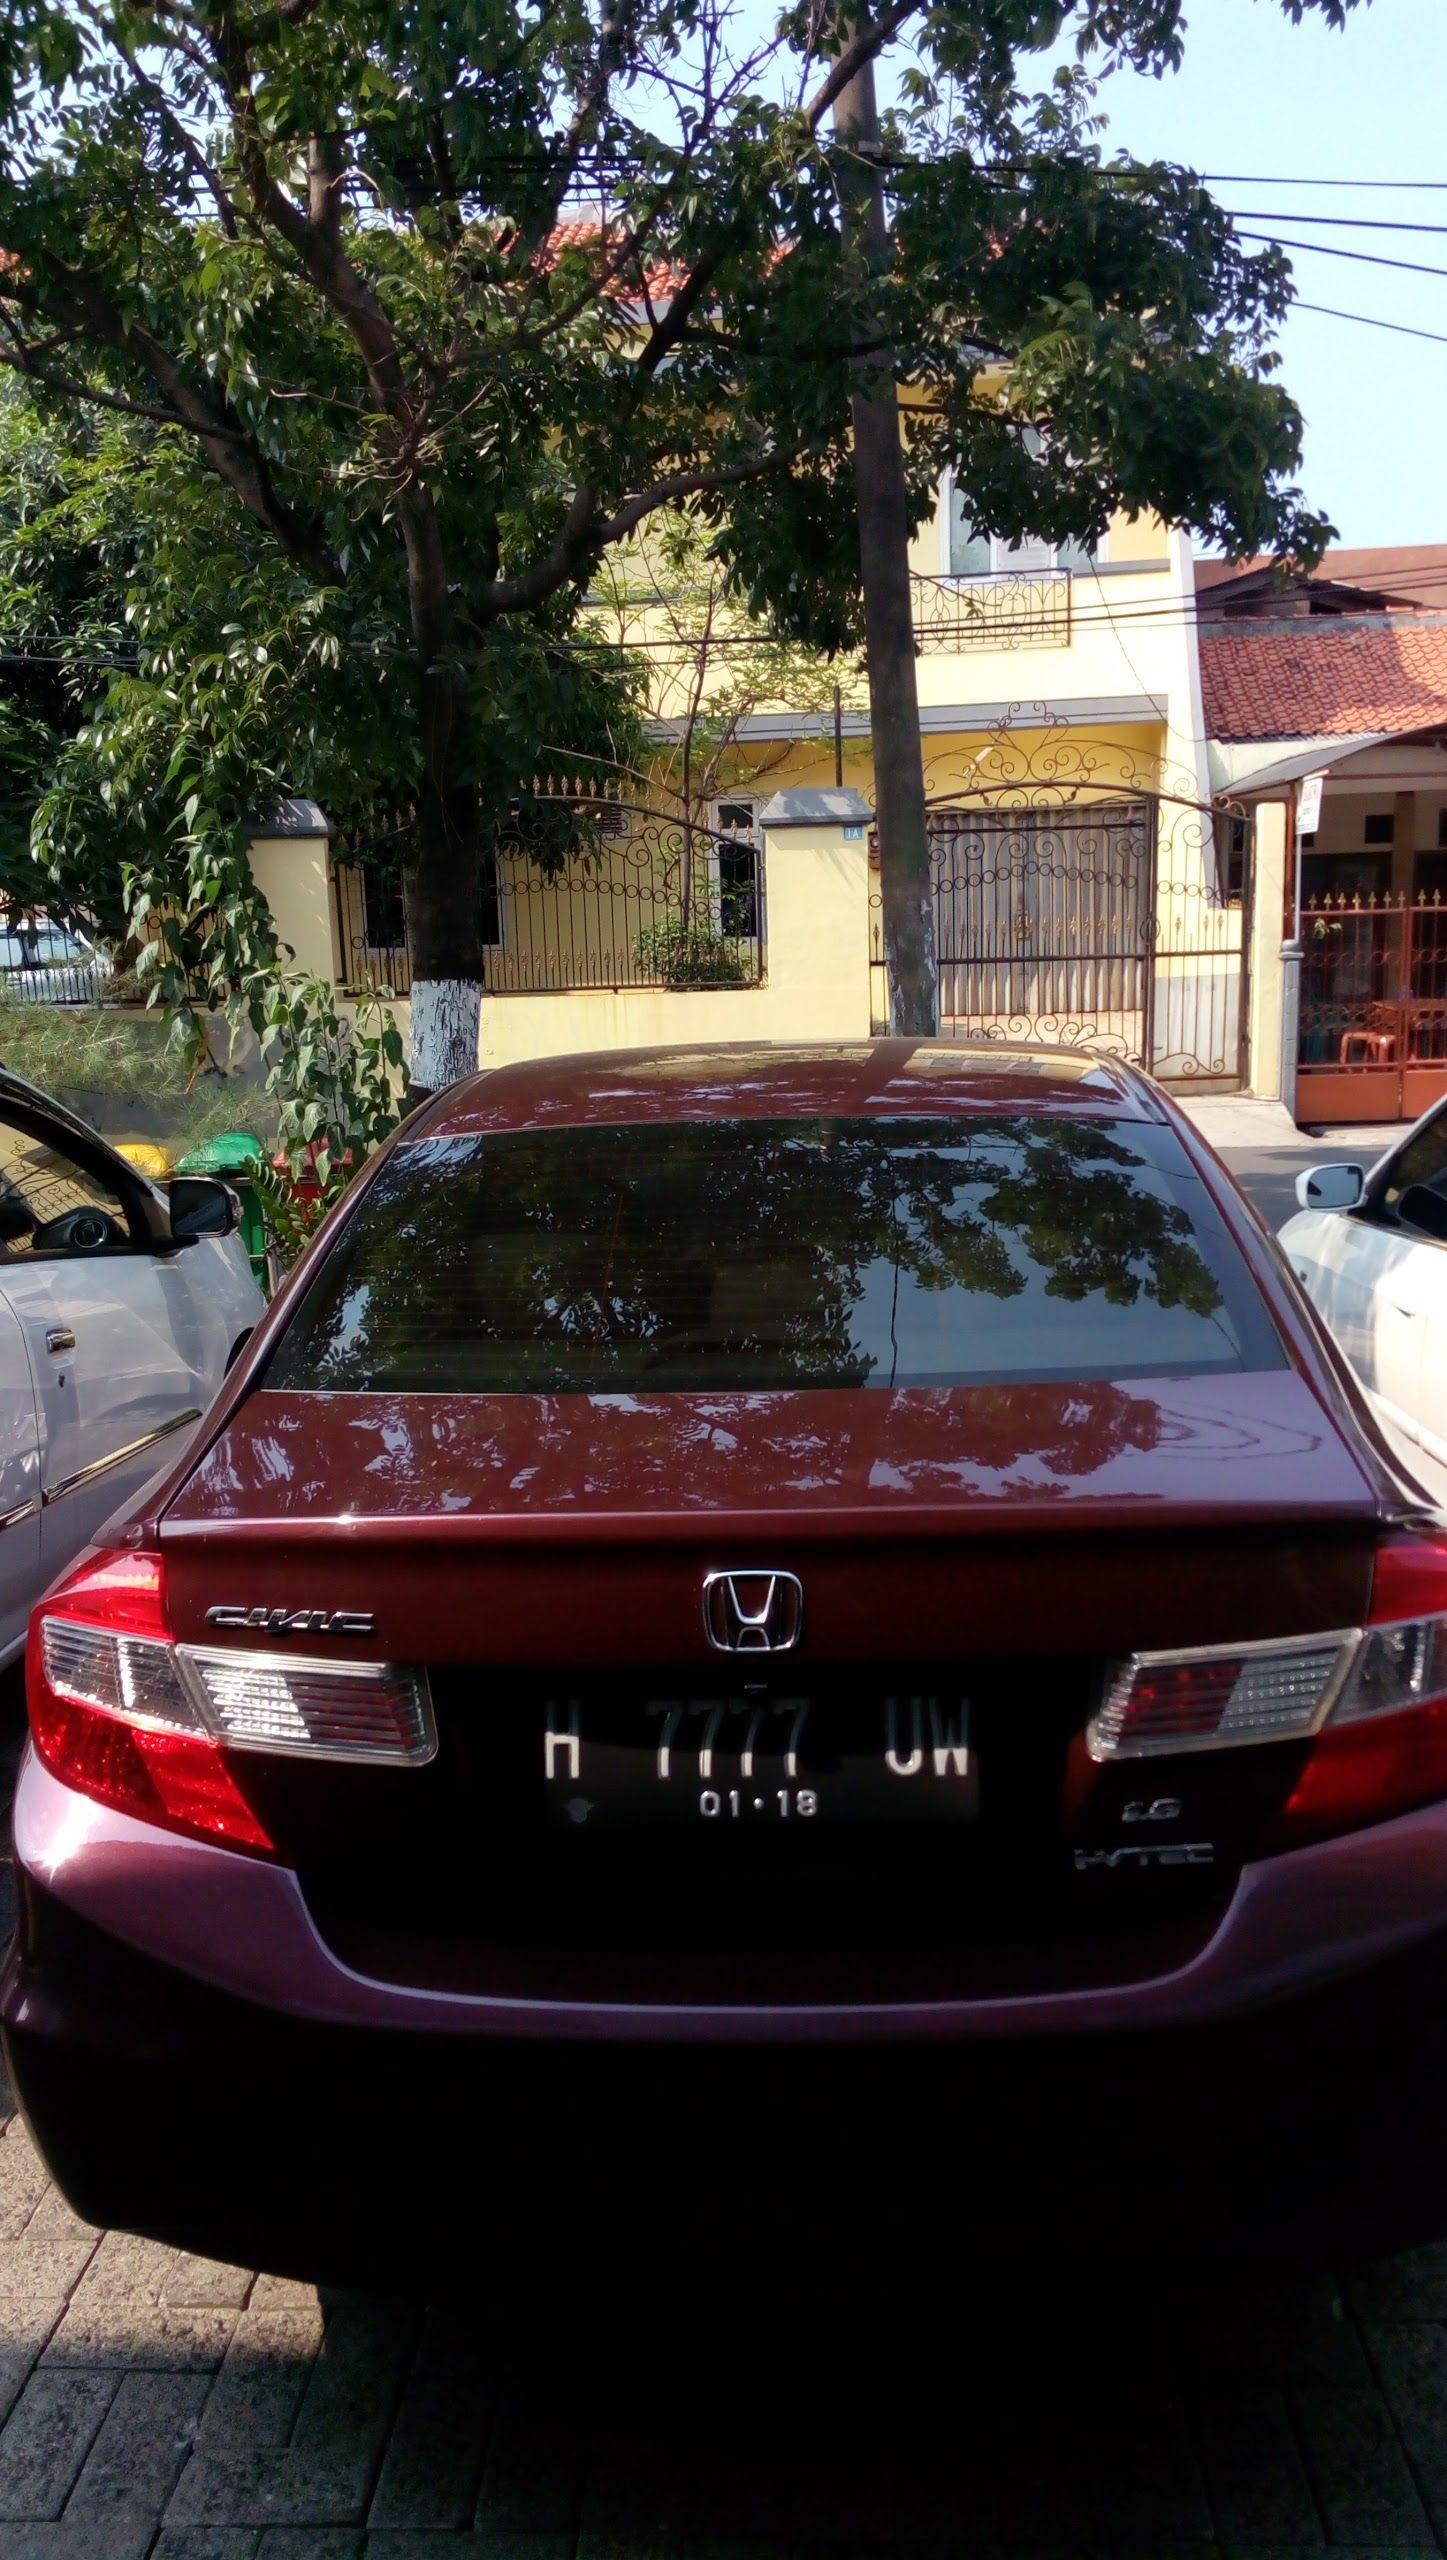 Jual Civic Matik 2012 Kondisi Muluz JAKARTA Mobil